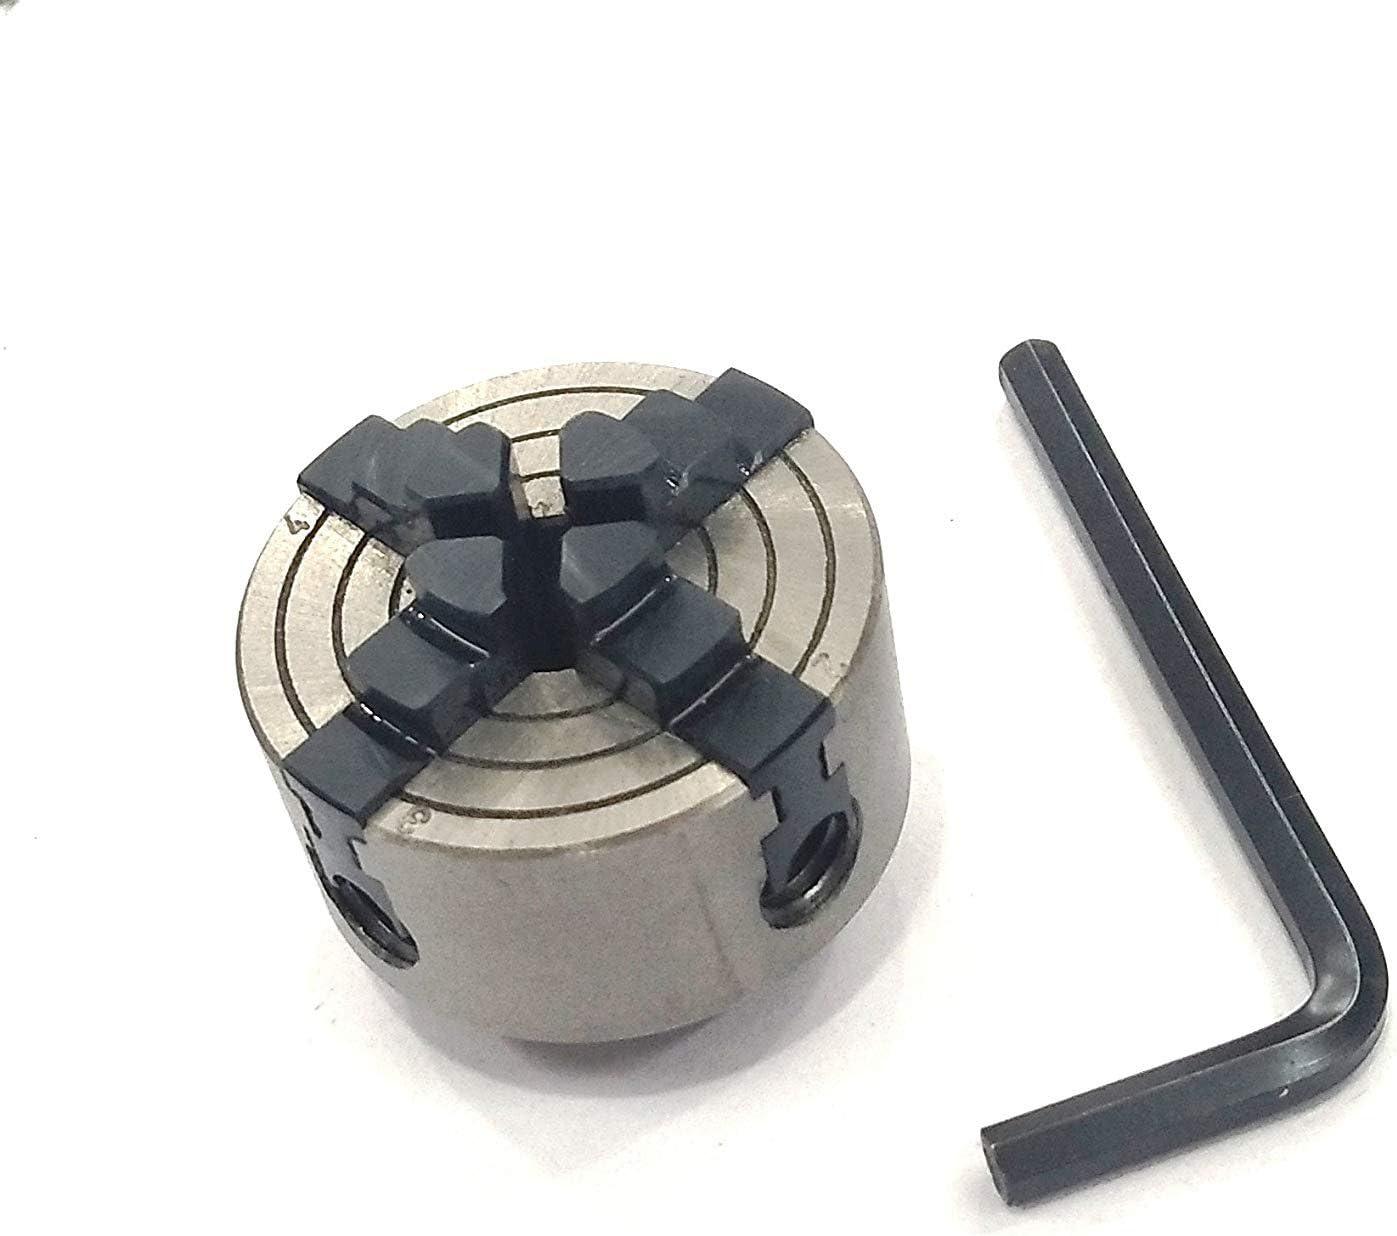 High Precision 65 mm 4 Jaw Chuck M14 x Unimat Thread for Mini Lathes